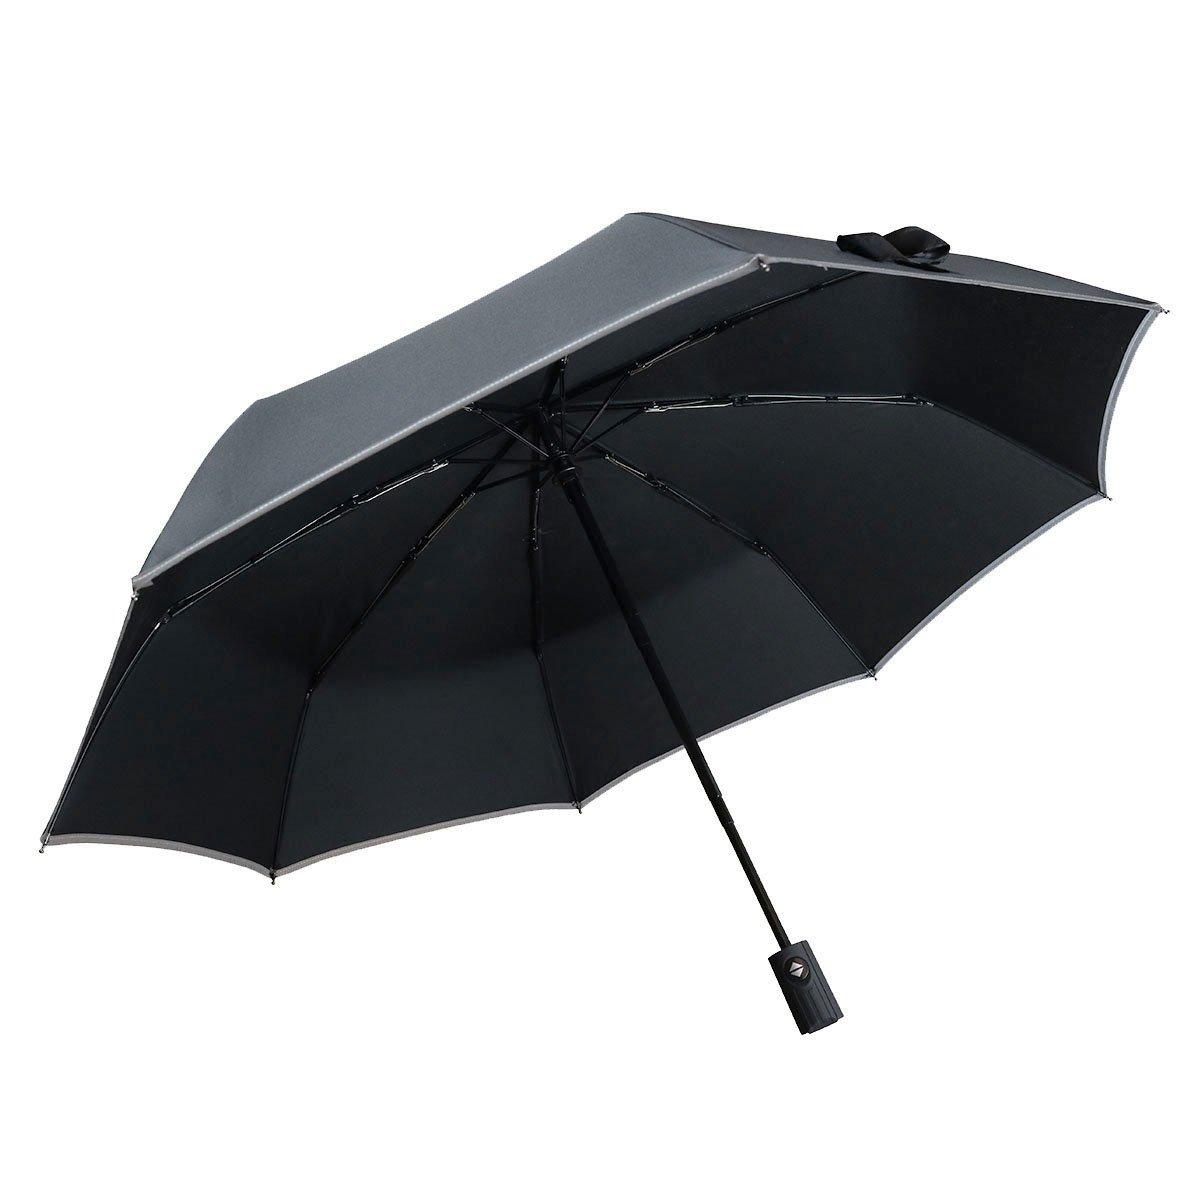 bemece Windproof Travel Umbrella, Compact Lightweight Foldable Automatic Umbrella for Men Women, Auto Open Close - Black